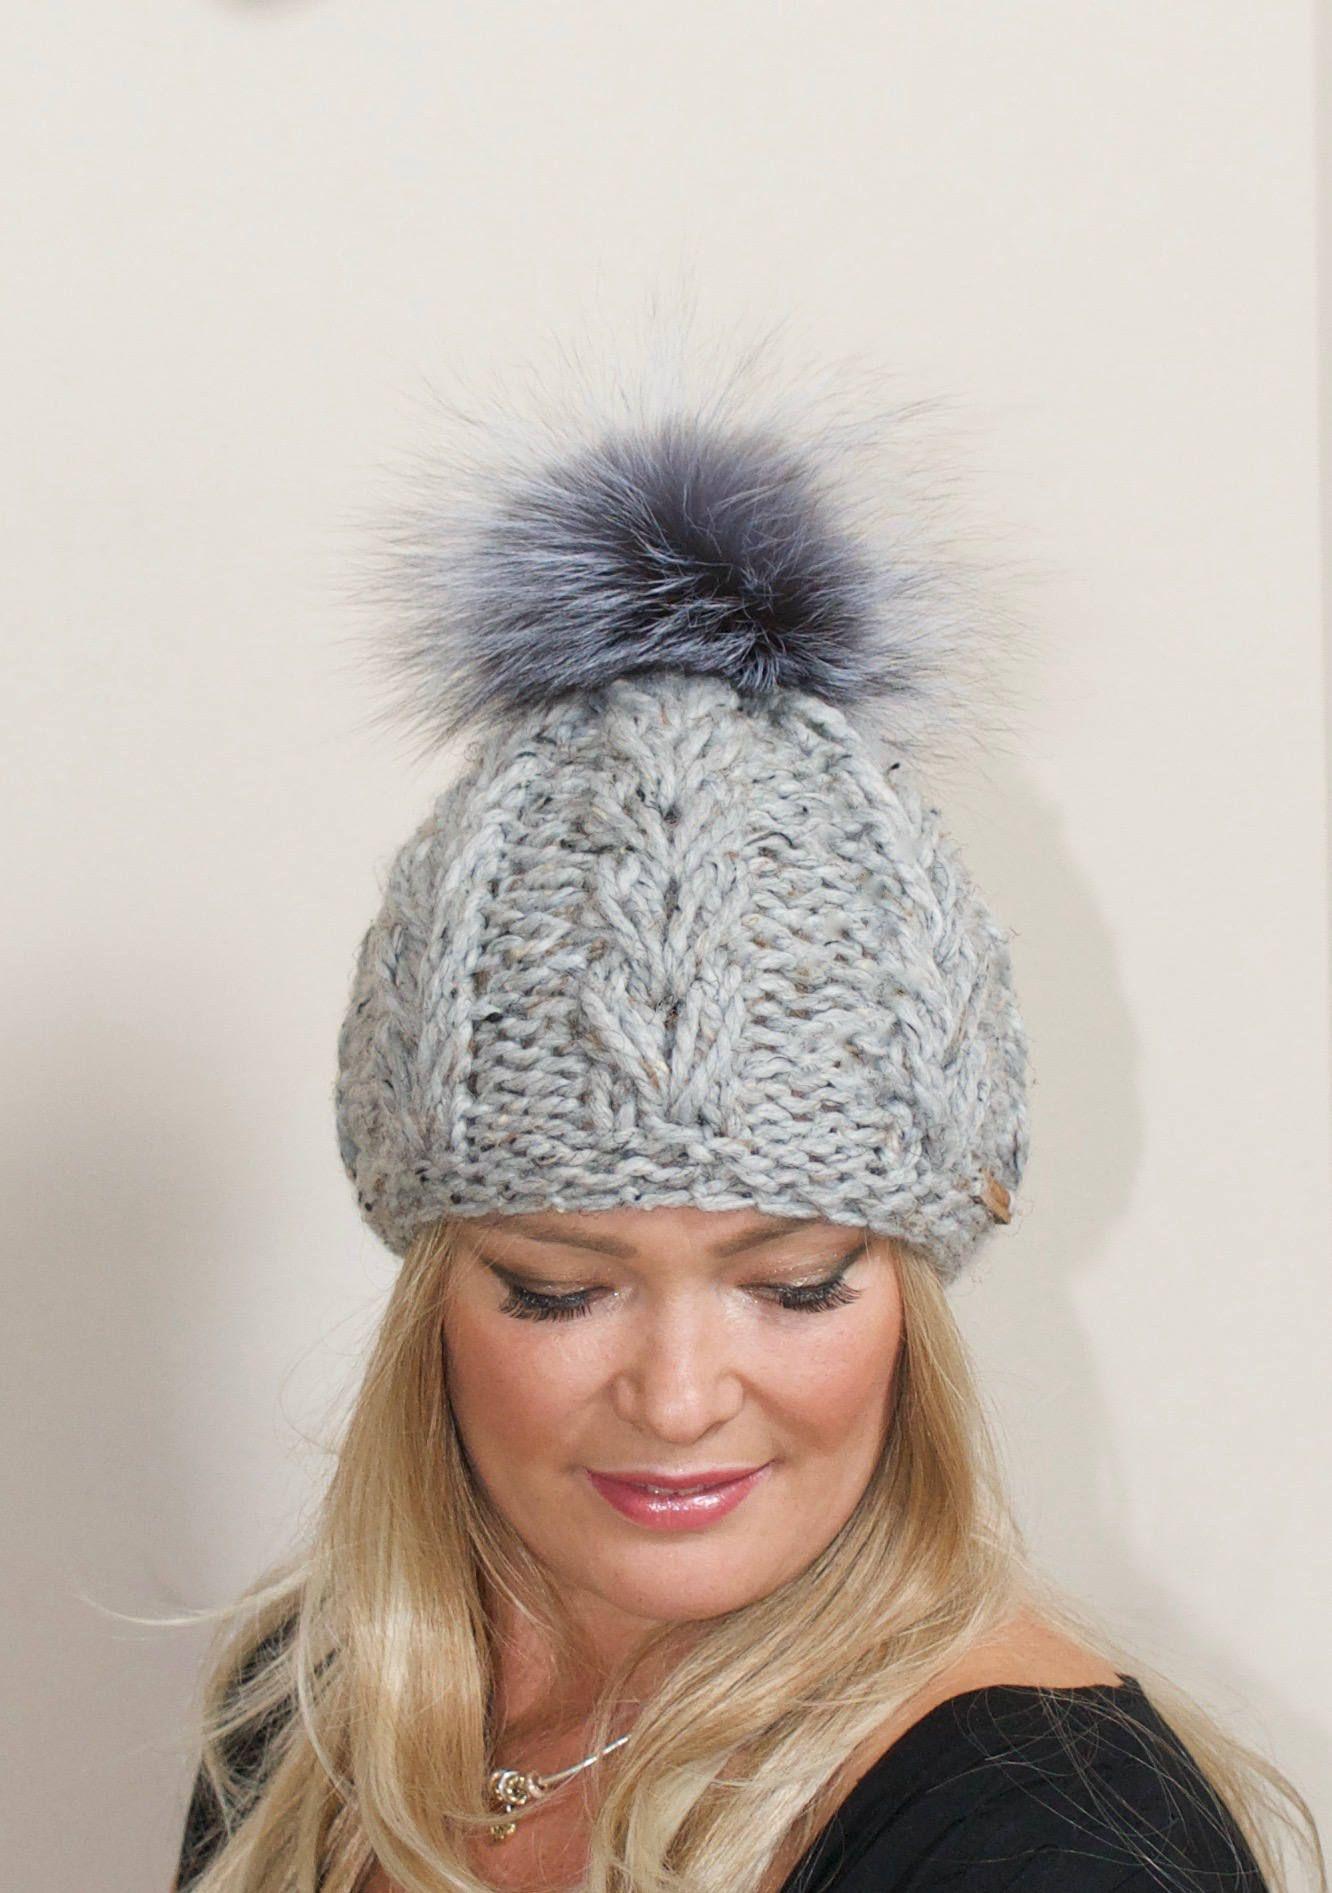 00f2d7629db Bobble Beanie Fur Pom Pom Hat Fur Pompom Beanie SALE Ski Hat Women CHOOSE  COLOR Cabled Hat Fox Fur Pom Pom Christmas Gift under 100 by lucymir on Etsy